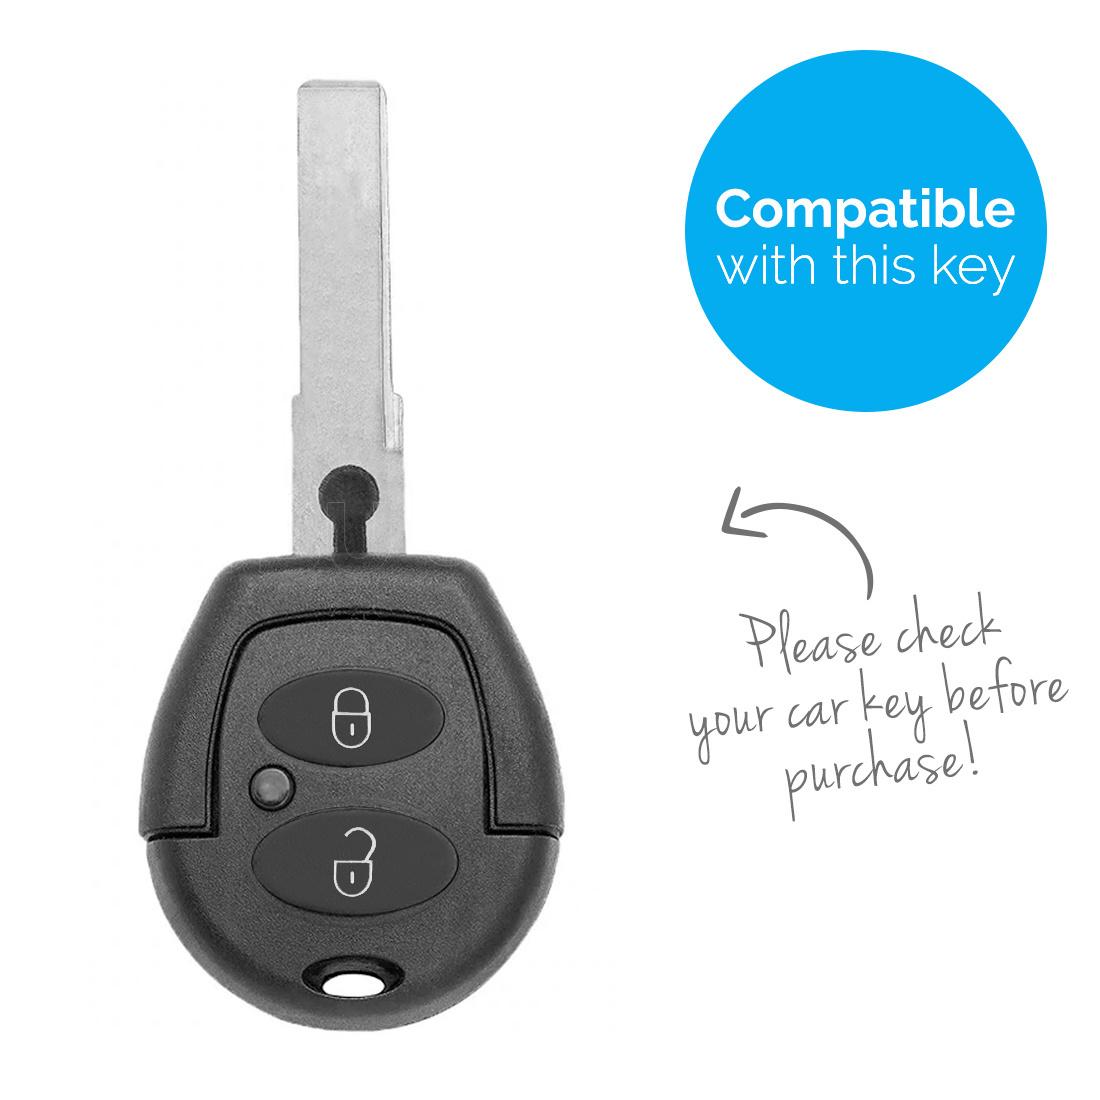 TBU car Autoschlüssel Hülle für Skoda 2 Tasten - Schutzhülle aus Silikon - Auto Schlüsselhülle Cover in Lindgrün